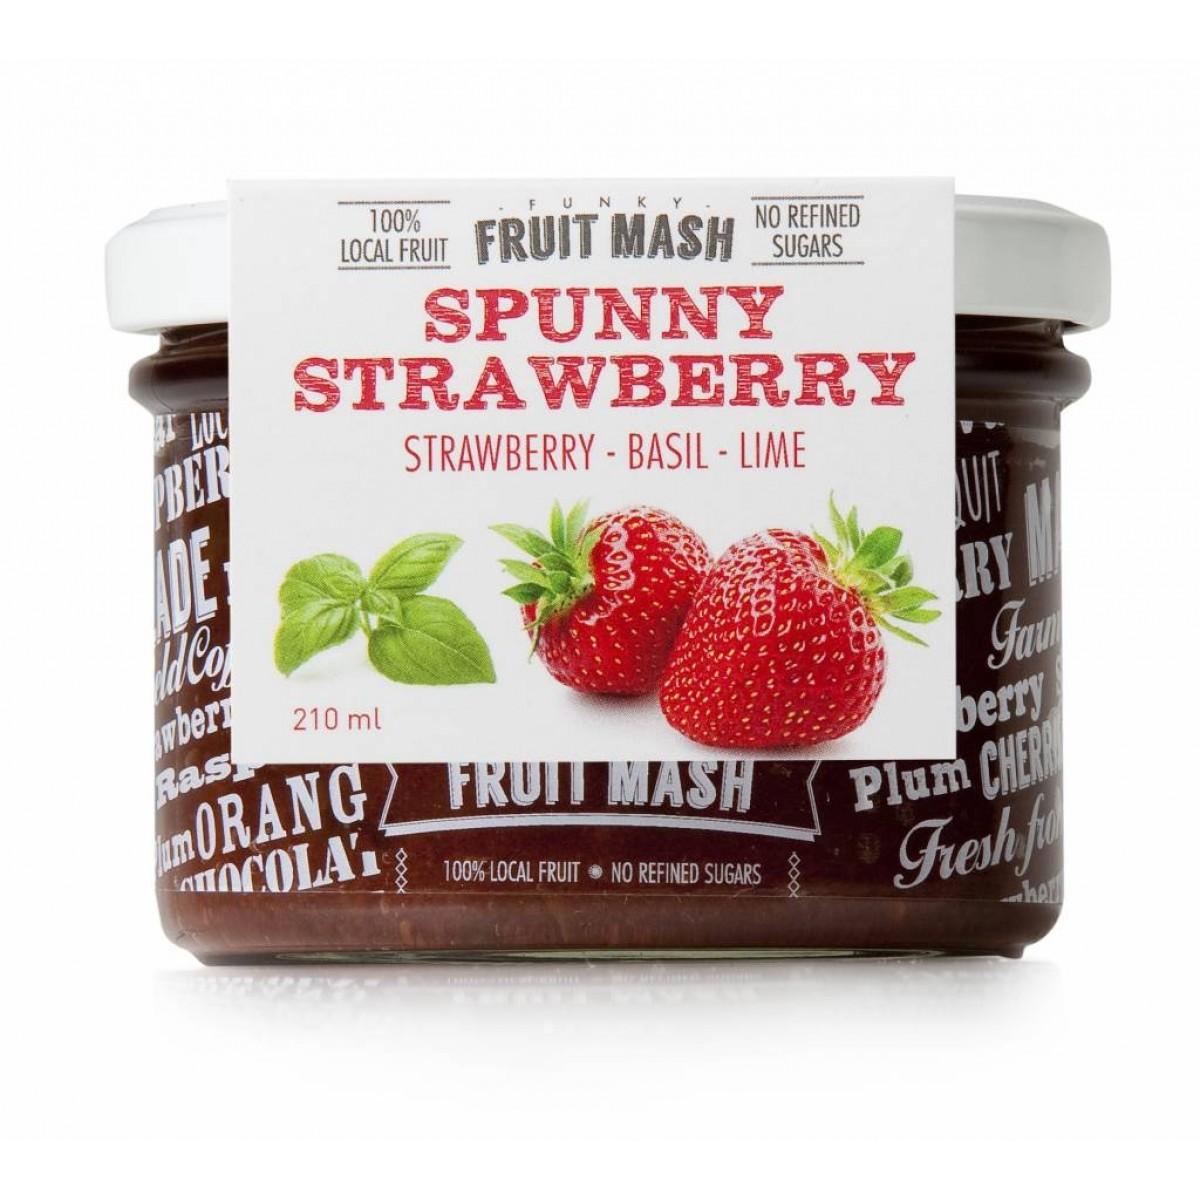 Funky Fruit Mash Spunny Strawberry